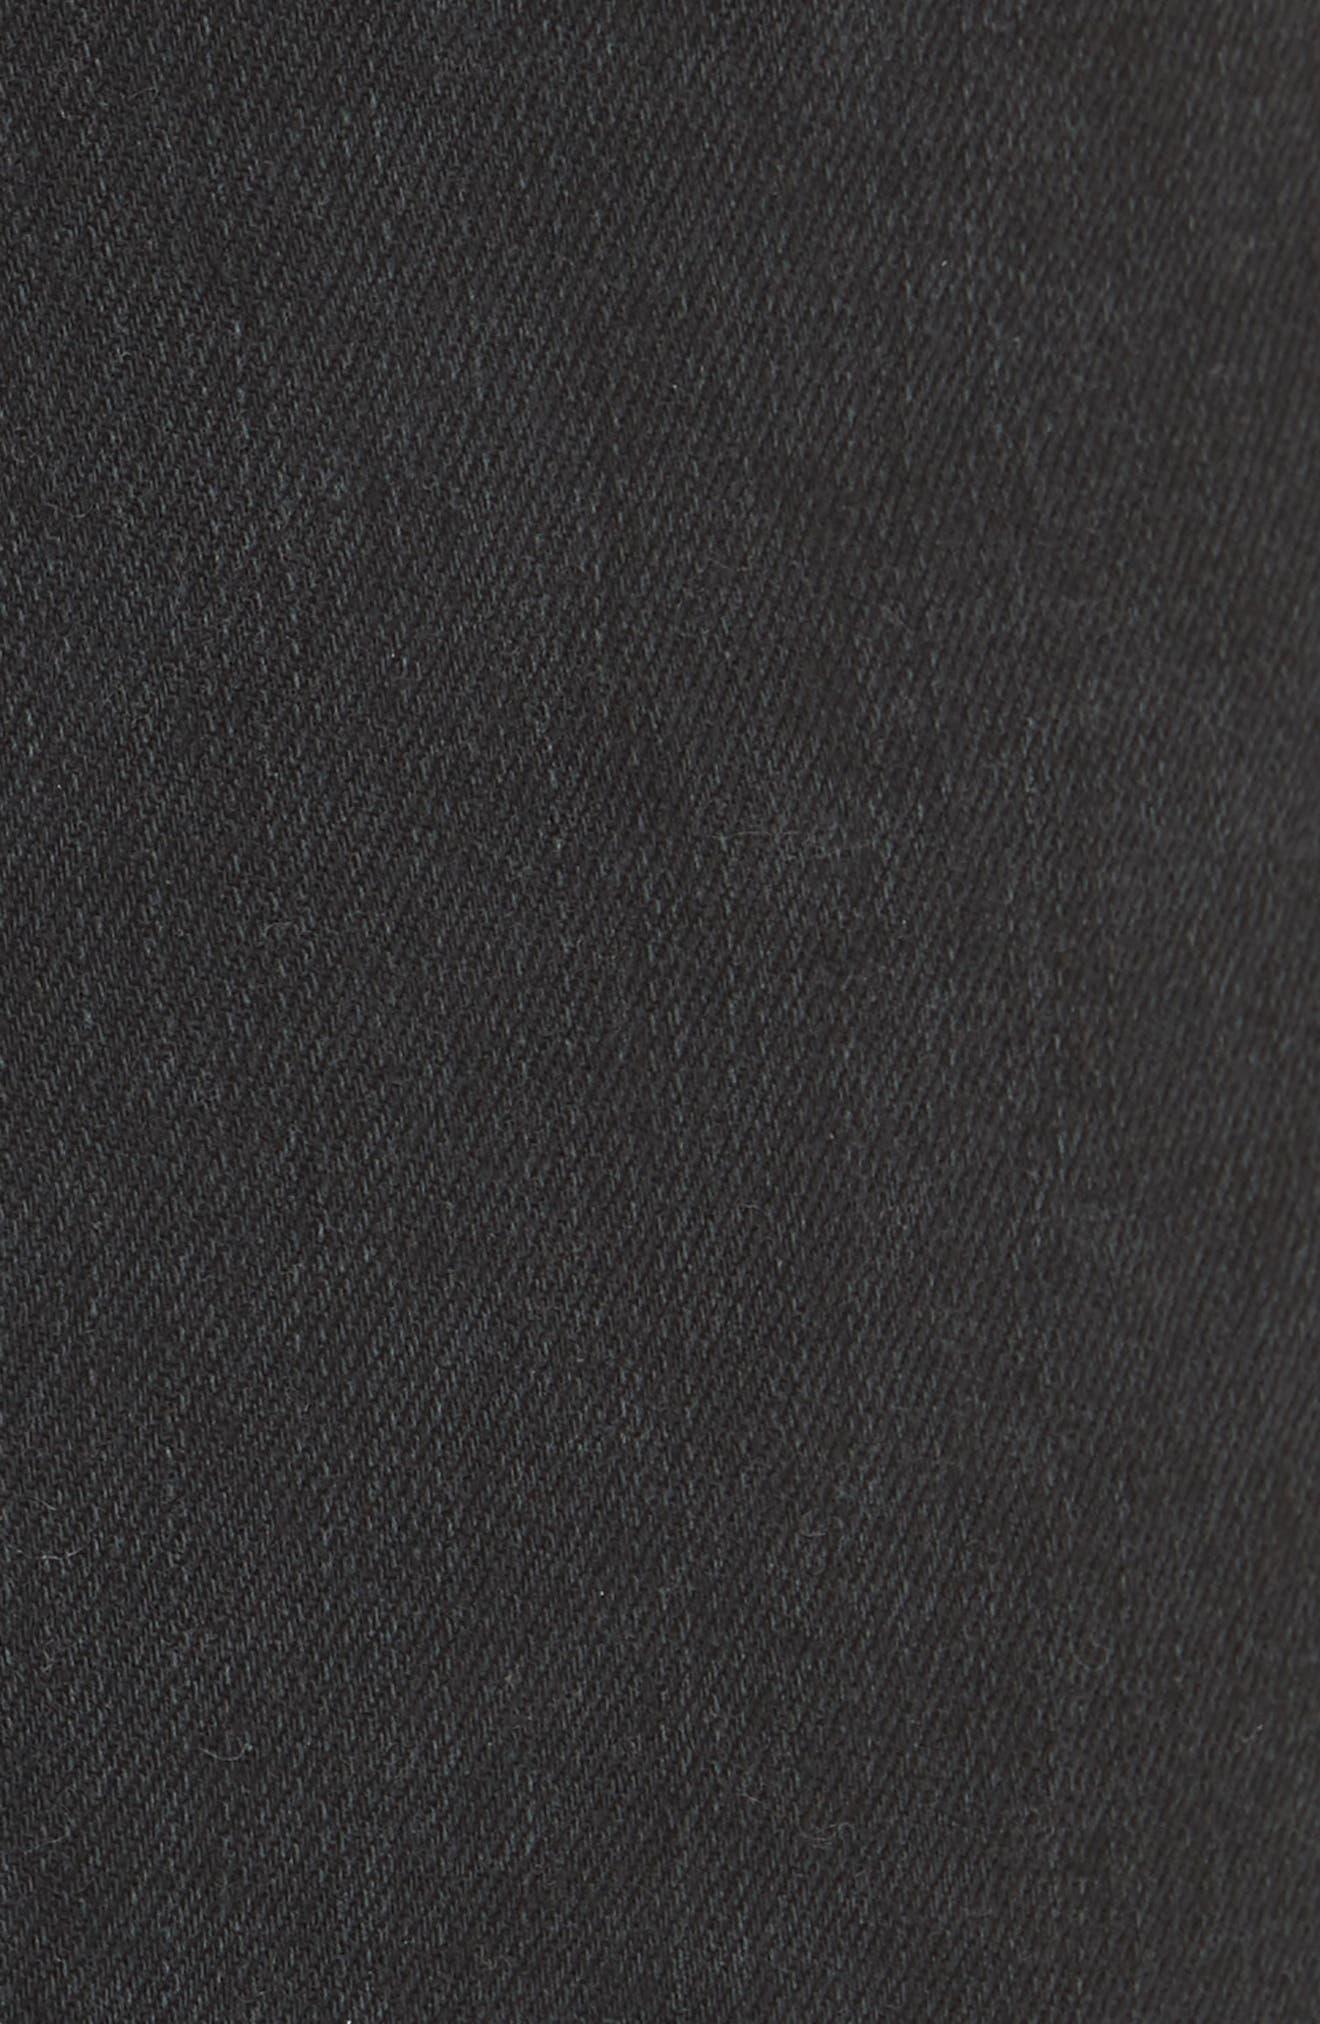 Frayed Hem Pull-On Ankle Jeans,                             Alternate thumbnail 5, color,                             WASHED BLACK